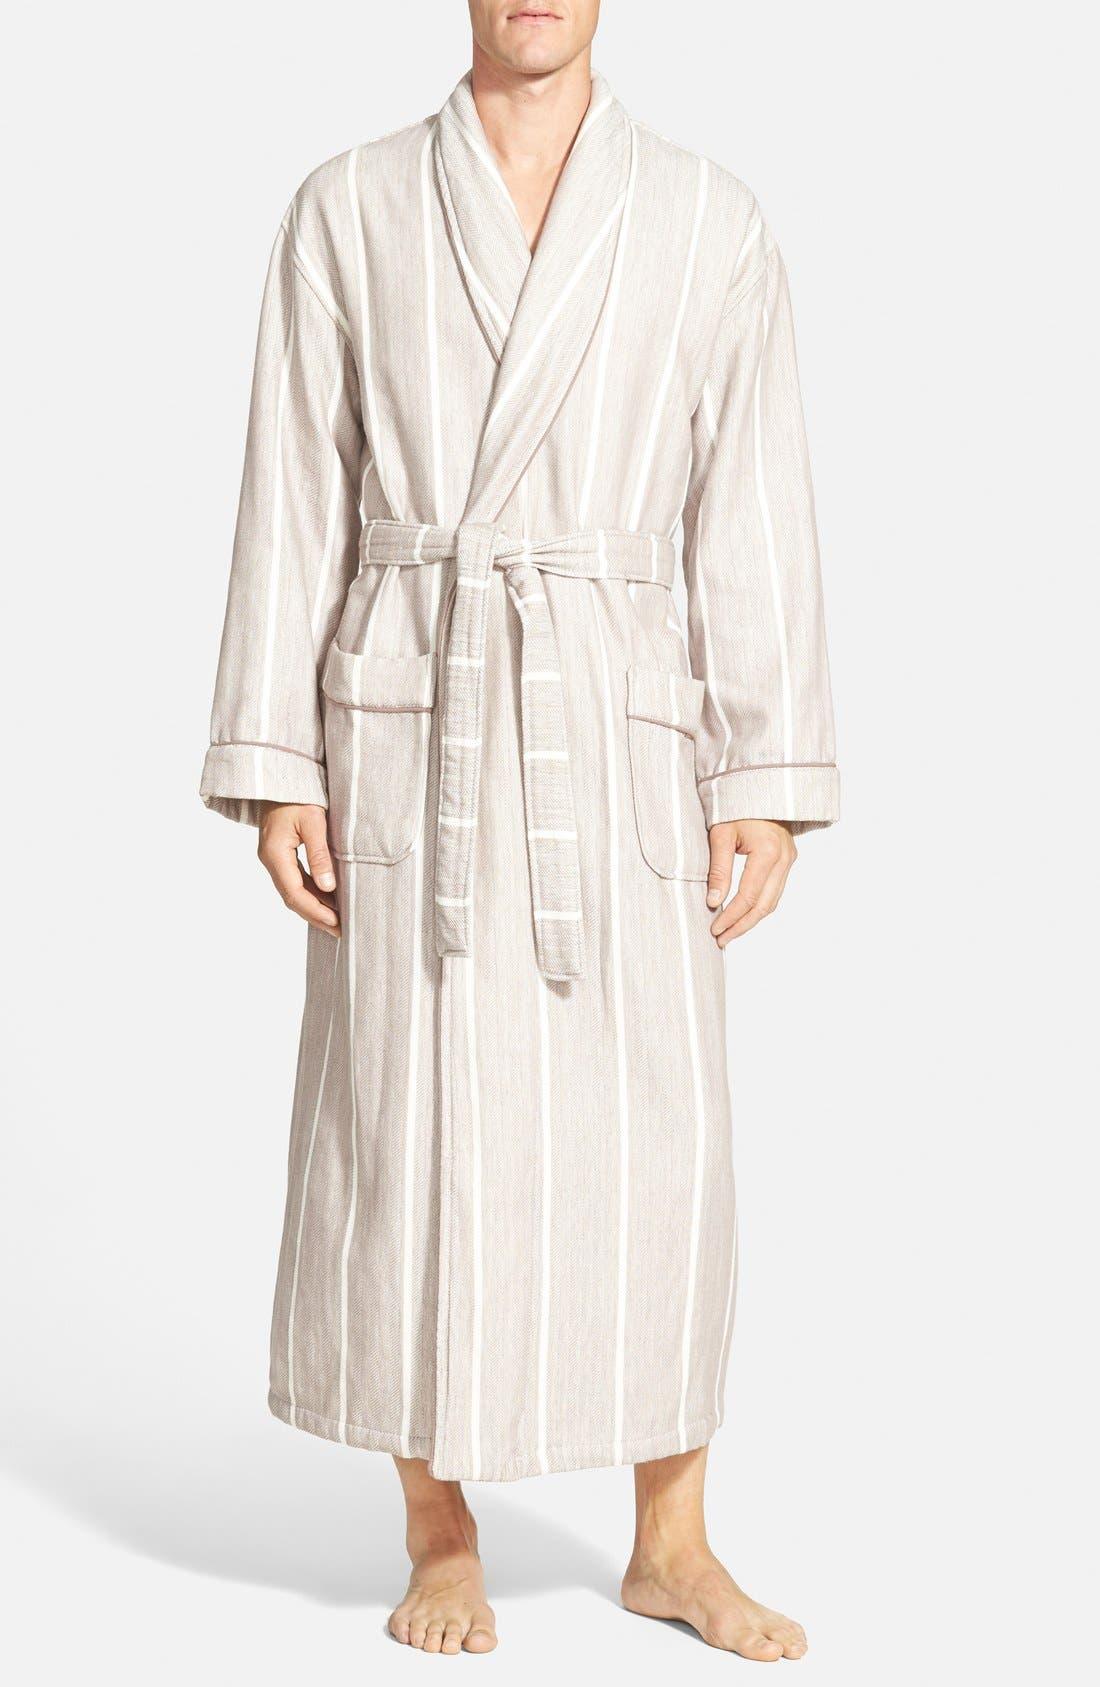 Alternate Image 1 Selected - Majestic International 'Breakers' Herringbone Cotton Robe